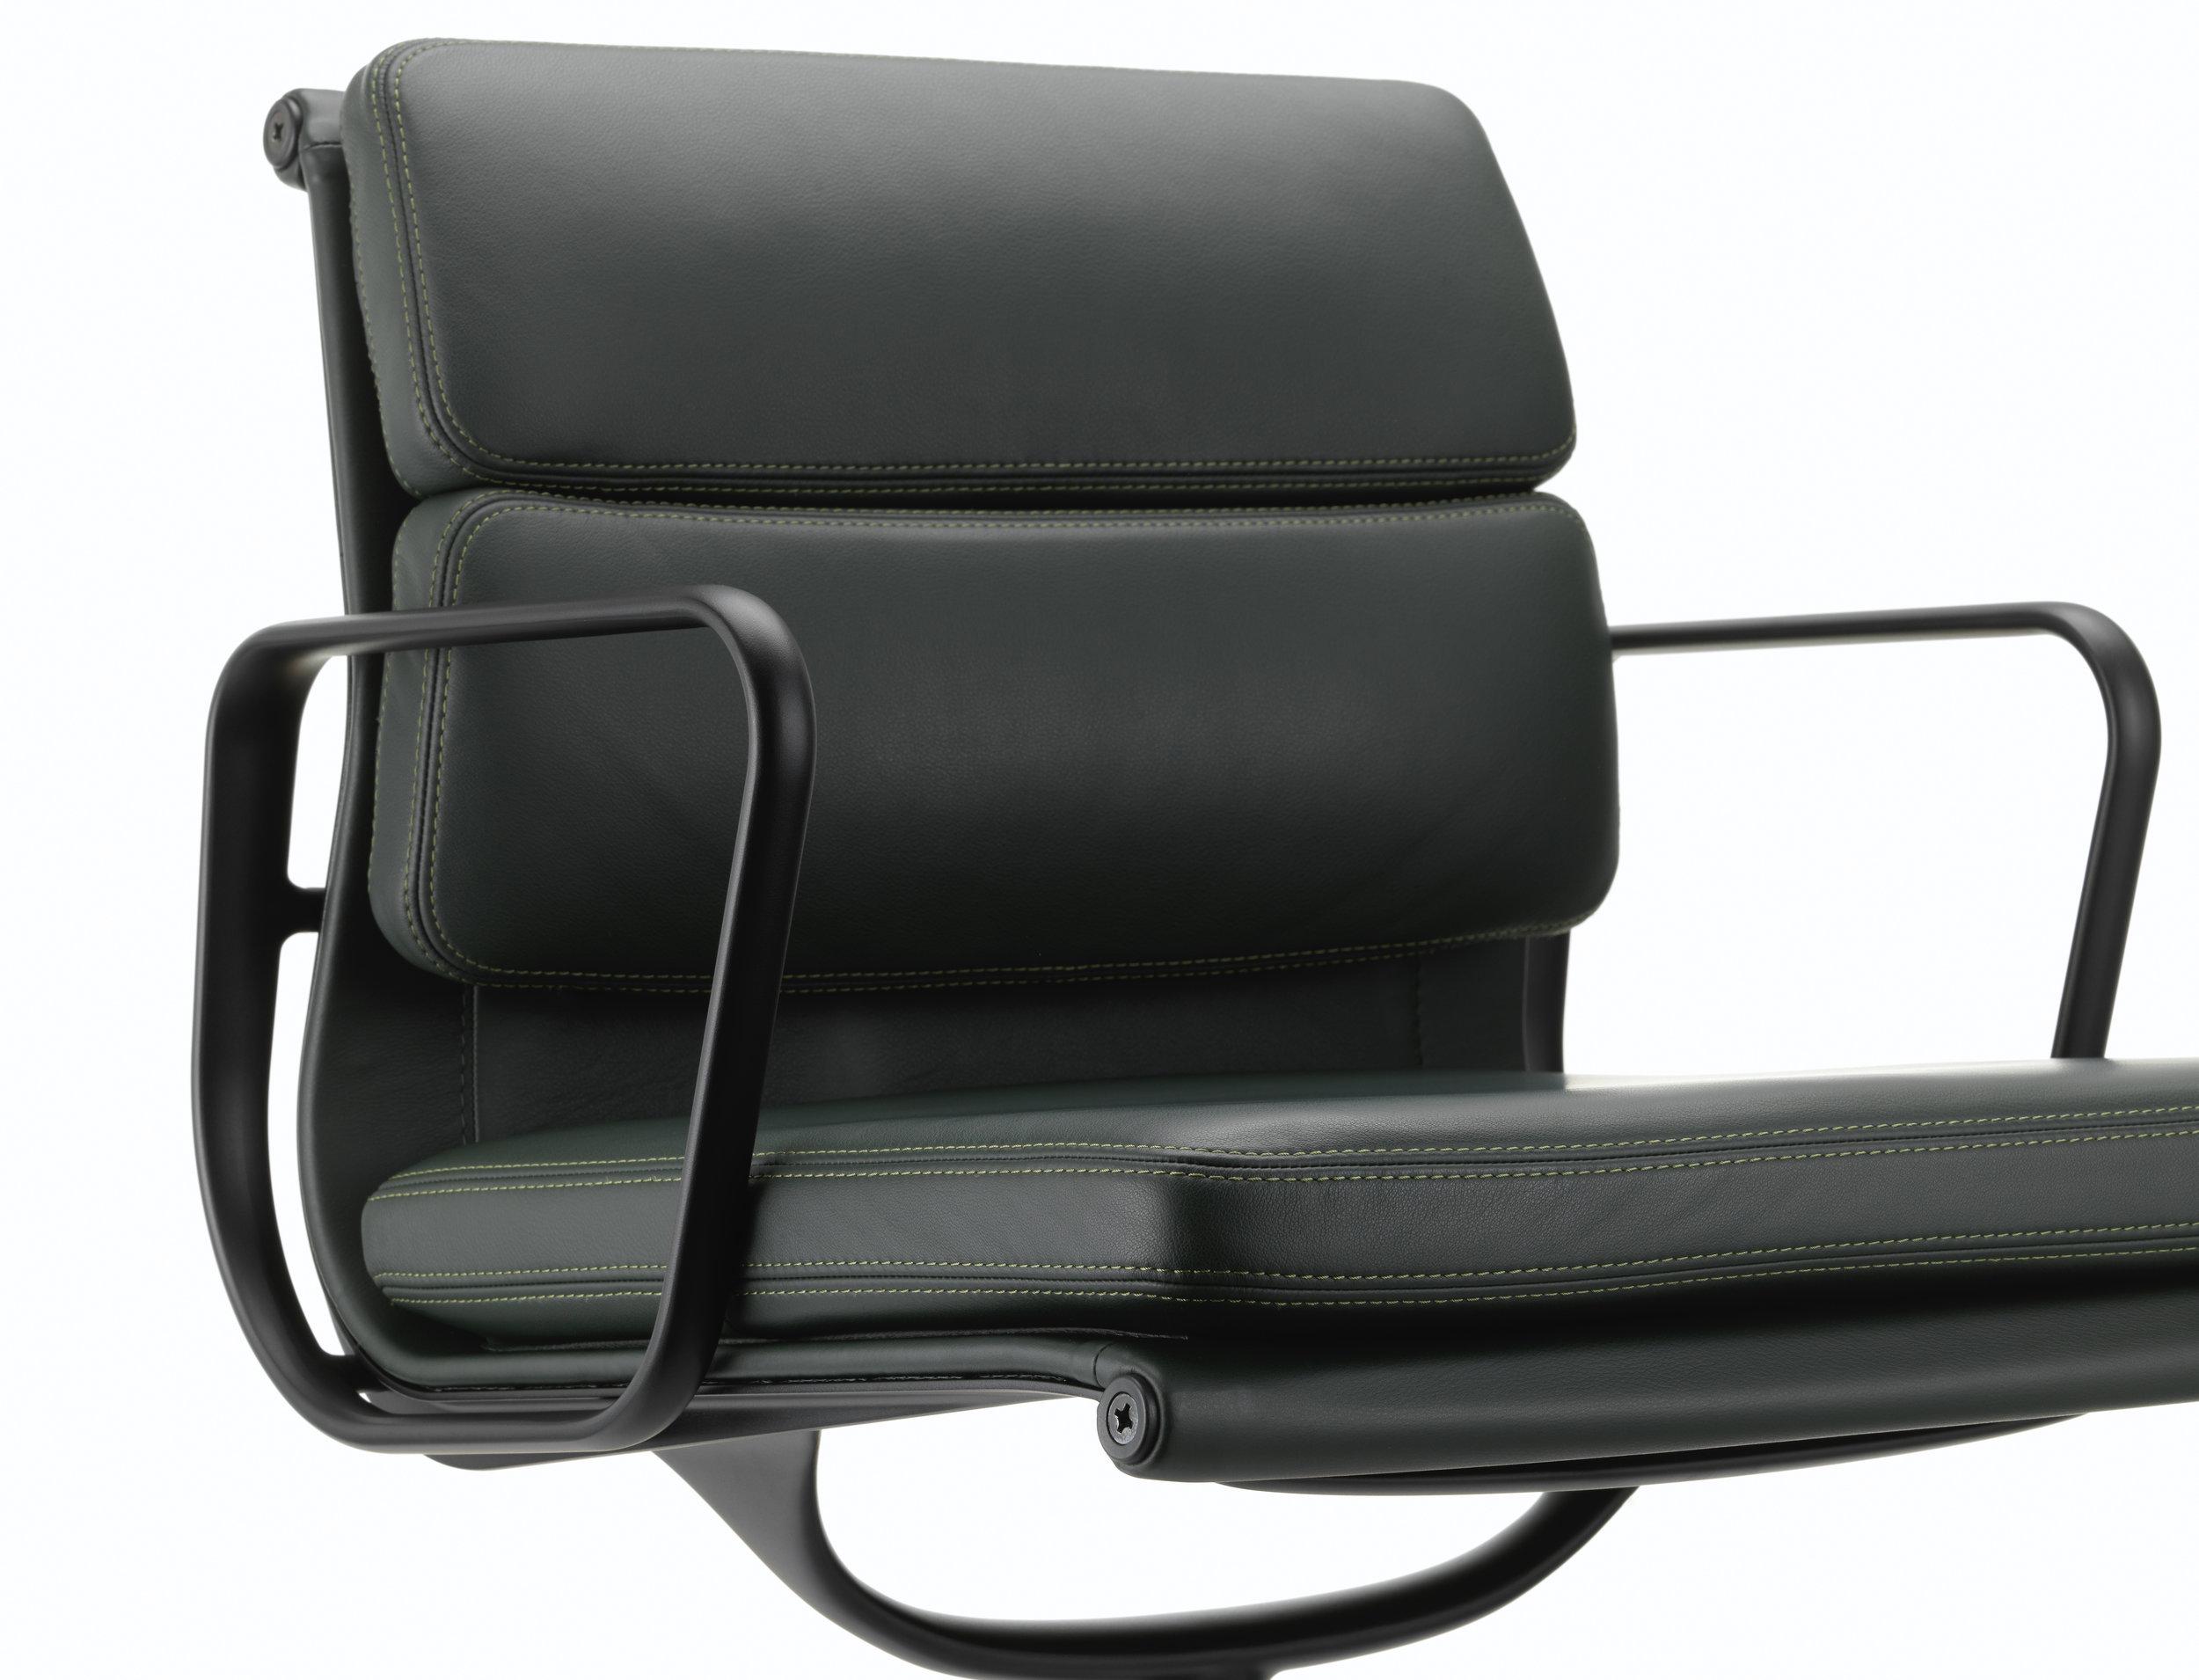 Vitra Loncin Hasselt Leuven Zoutleeuw Mechelen brussel Bruxelles brabant en Limburg design meubelwinkel 2514743_Soft Pad Chair EA 208_master.jpg